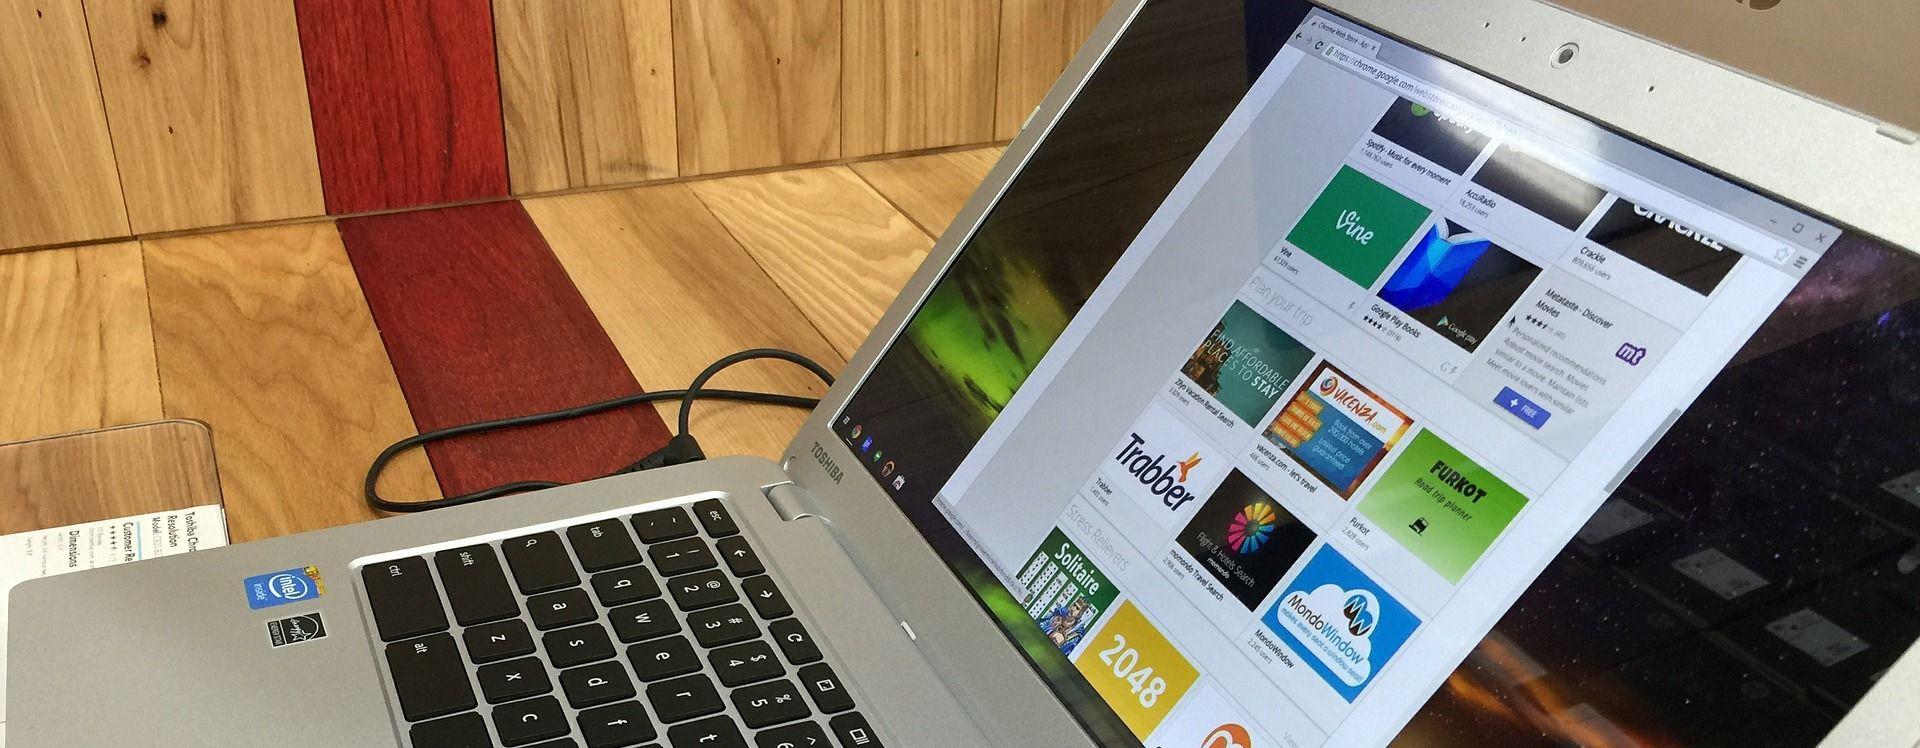 Lenovo ThinkPad X131e Chromebook 11 6